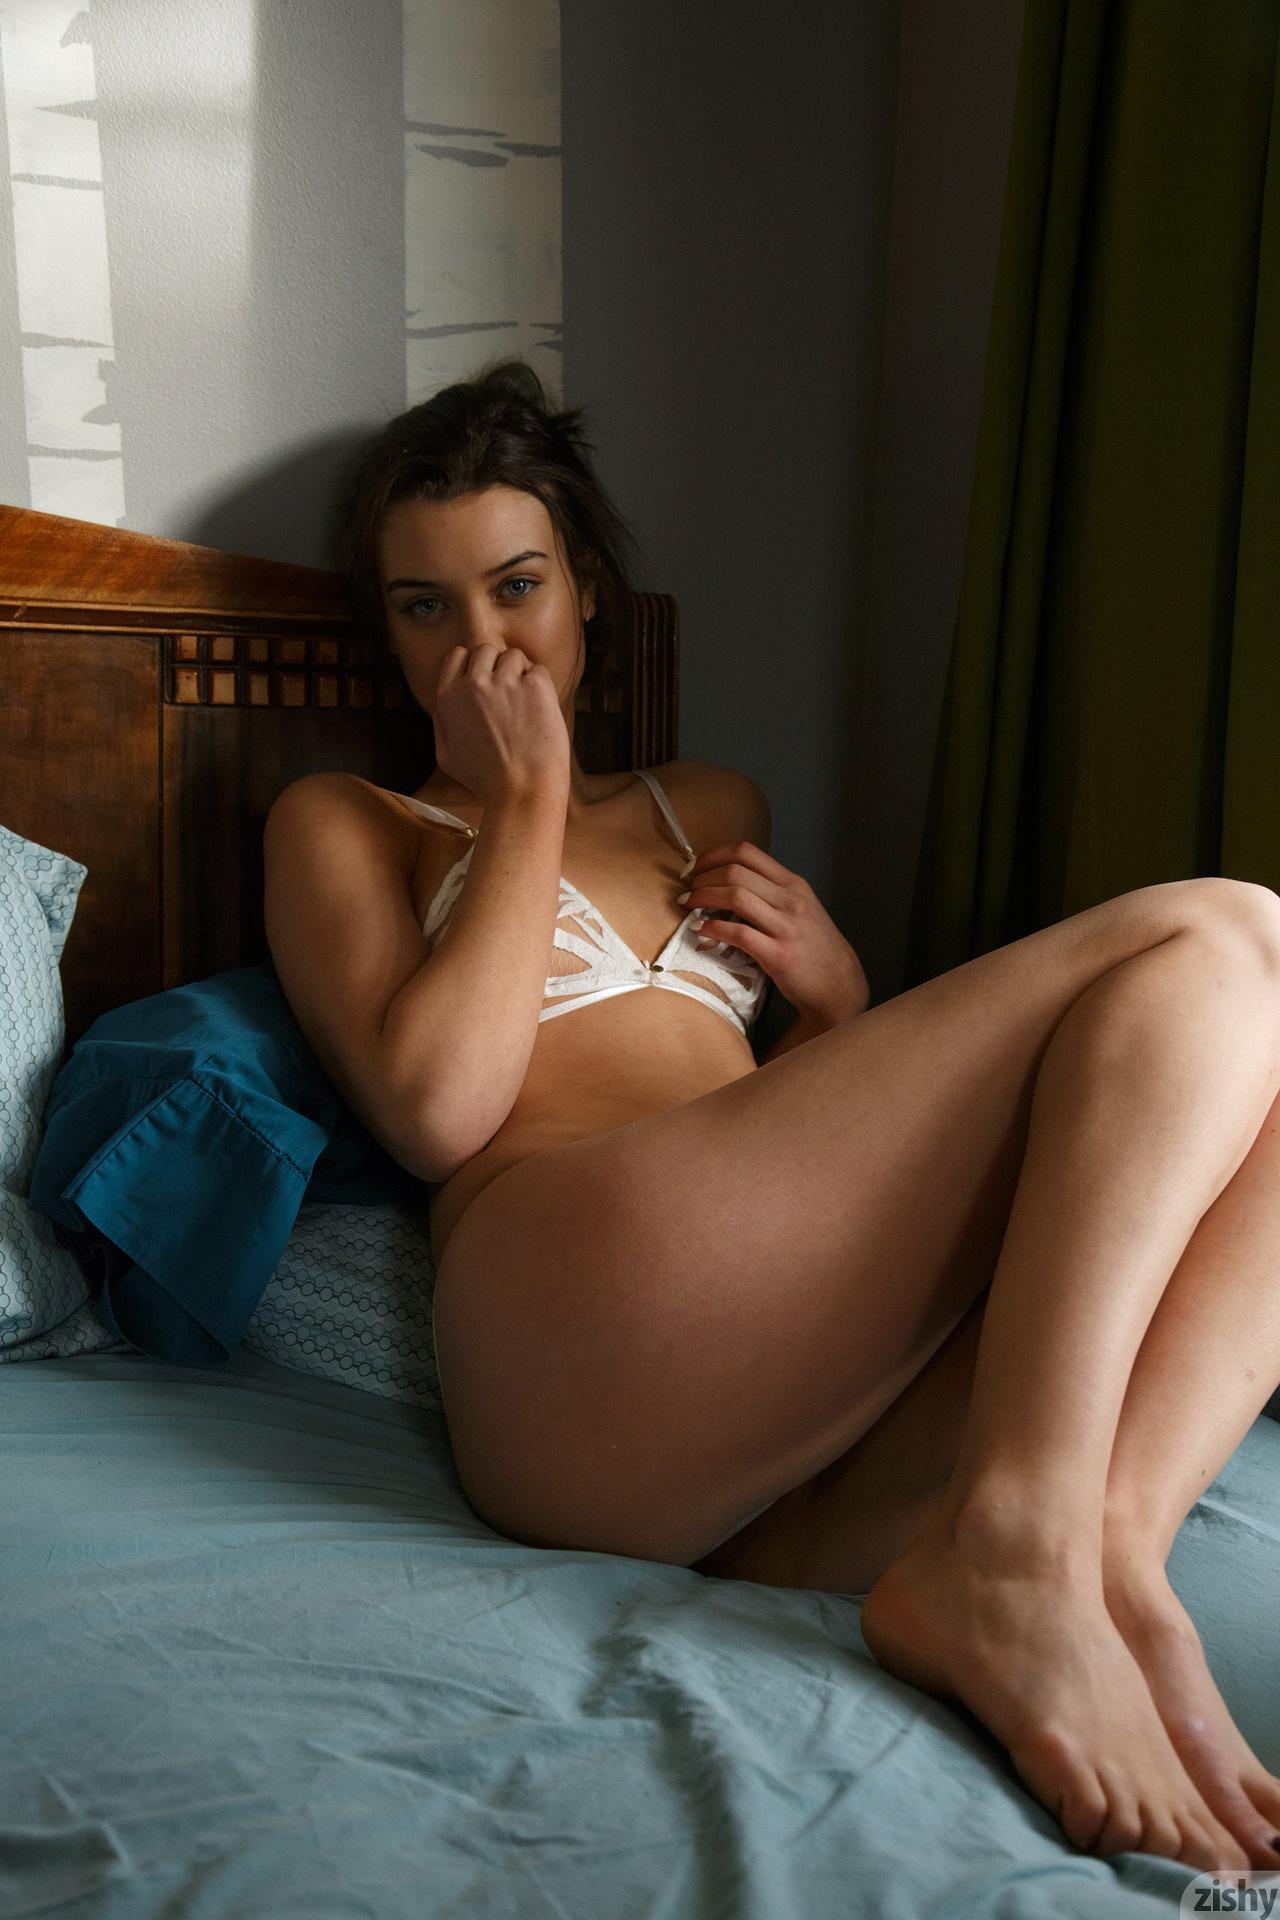 Laina Shendoah For Gooseberry Zishy (29)